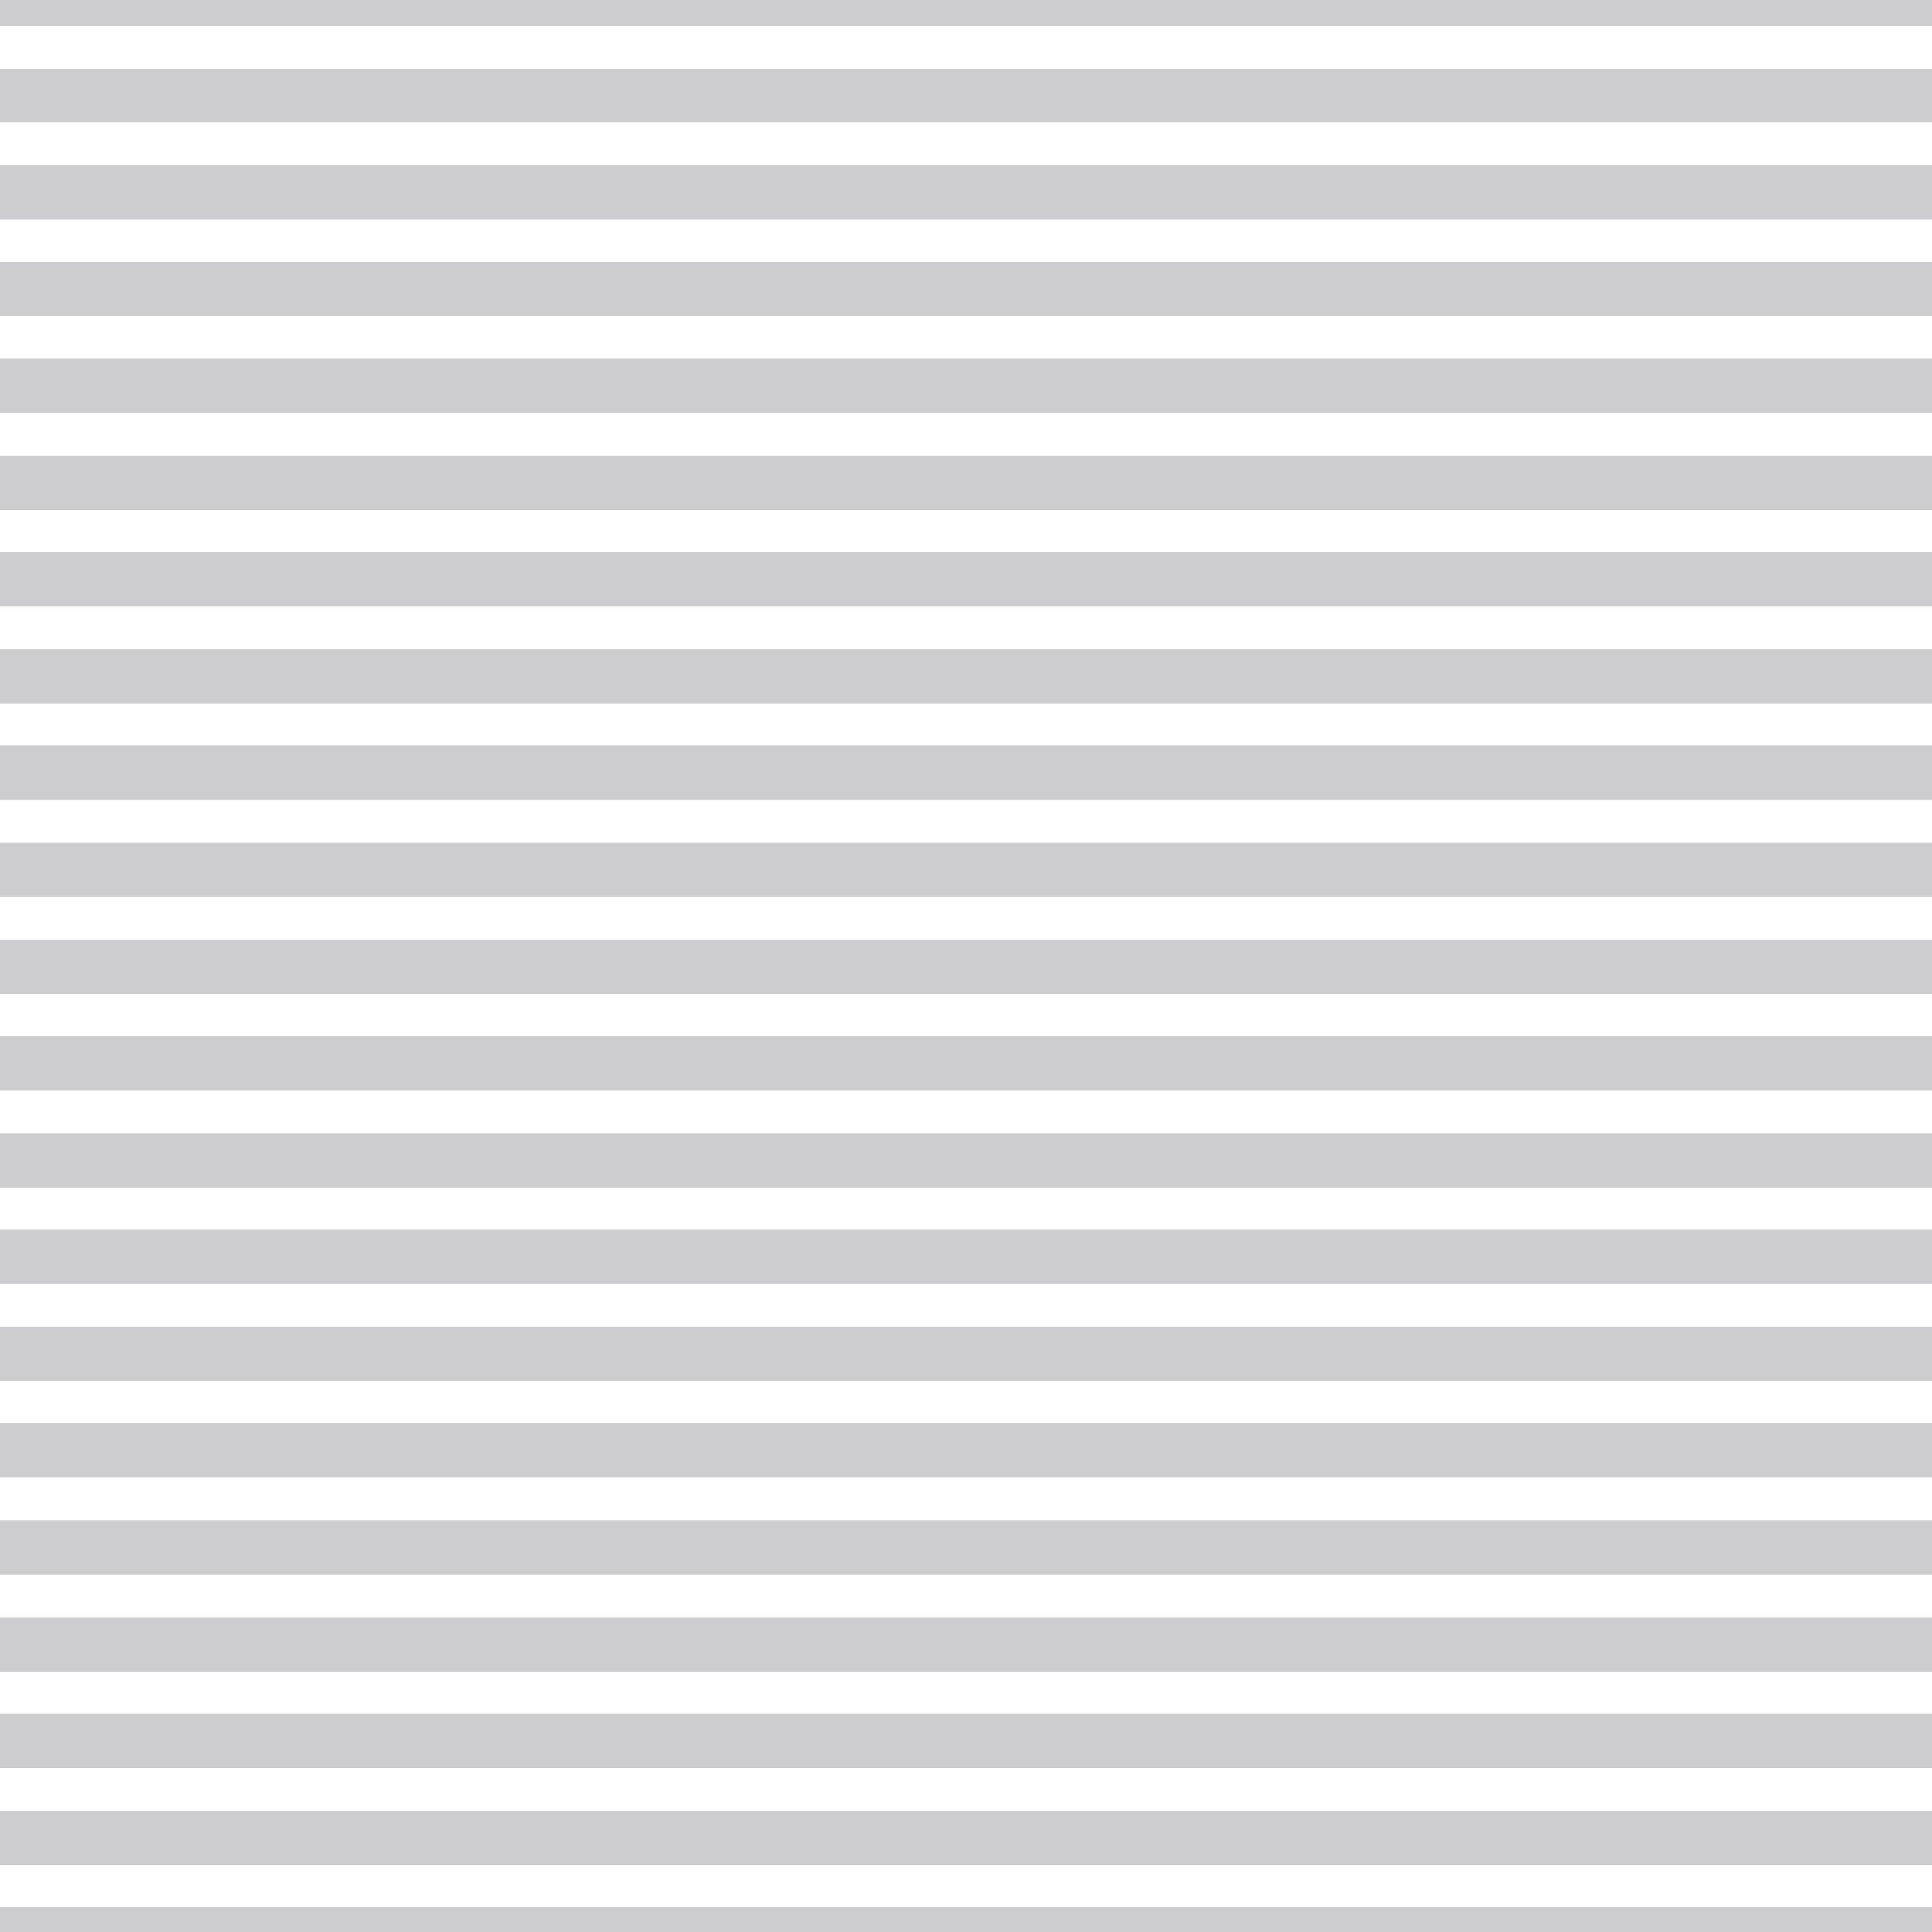 horizontal striped background wwwpixsharkcom images